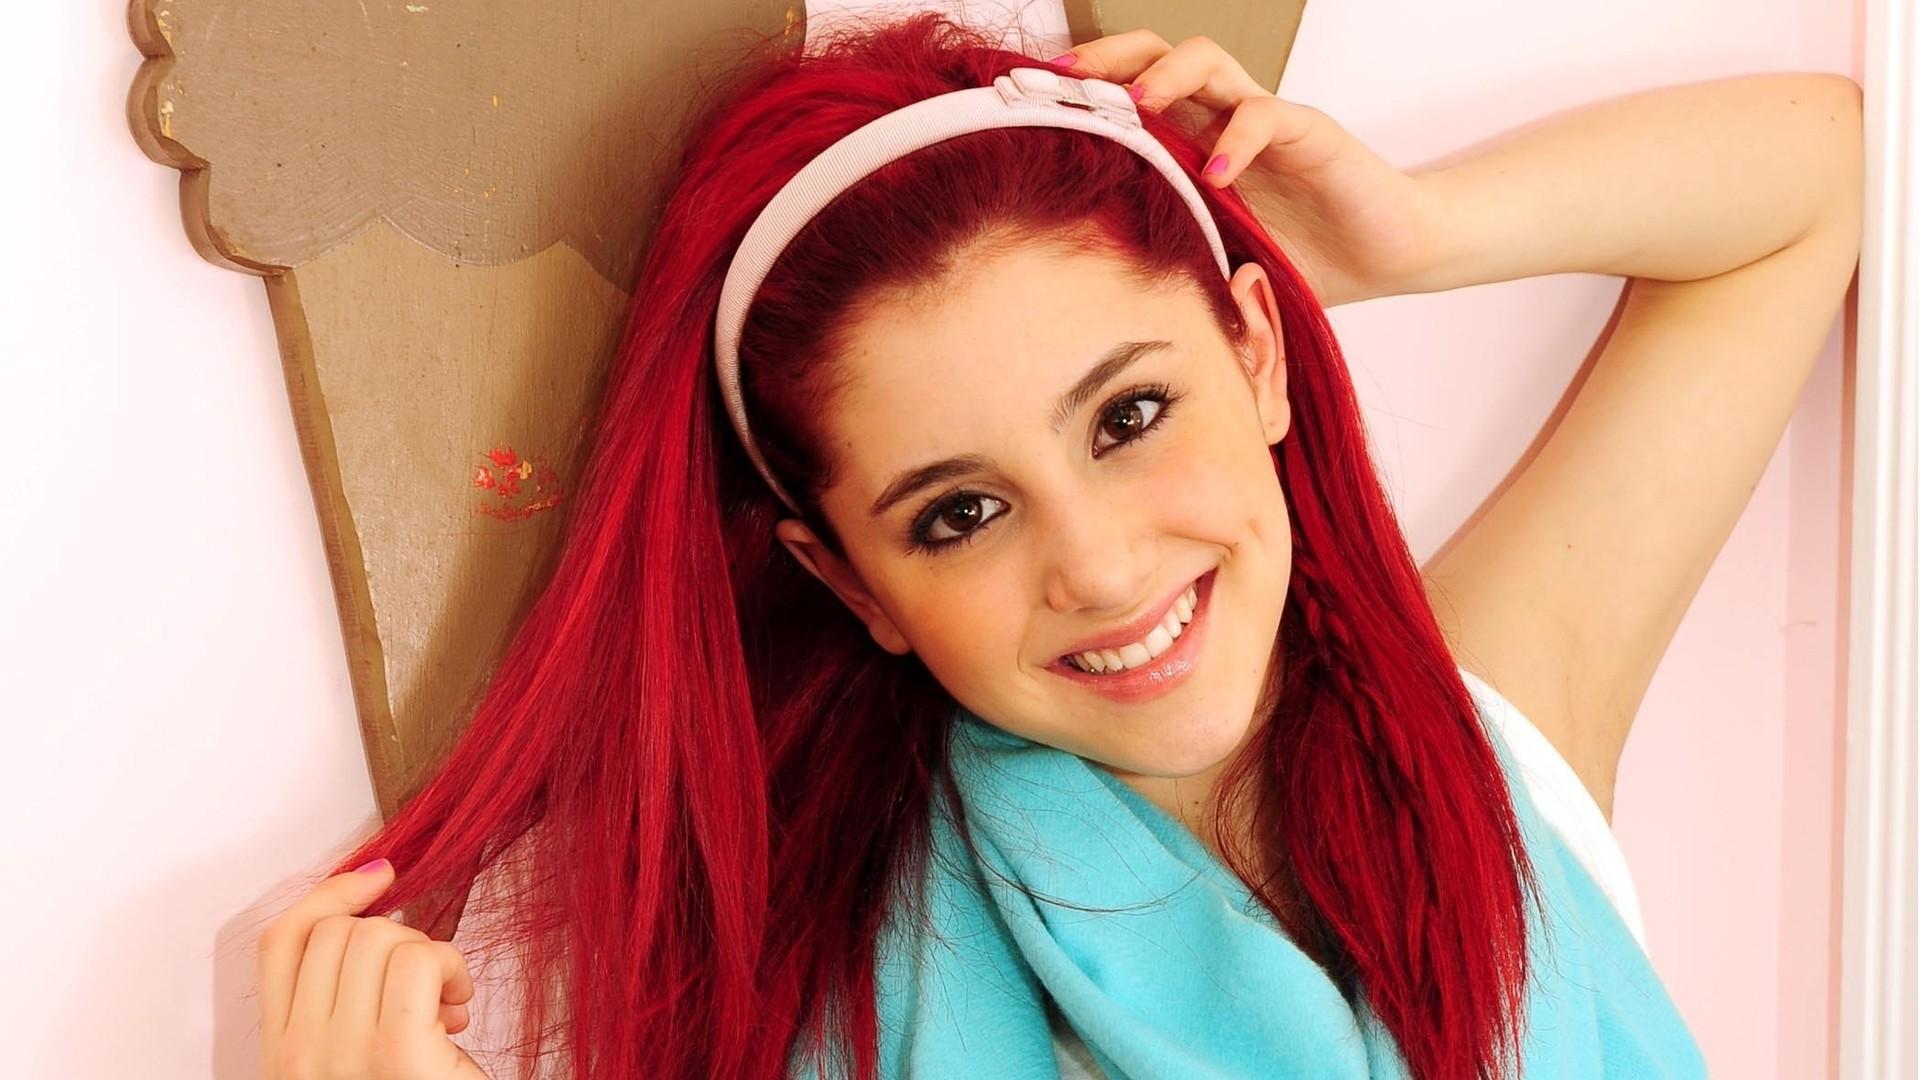 Ariana Grande Wallpaper 1920x1080 Celebrity - Ariana Grande